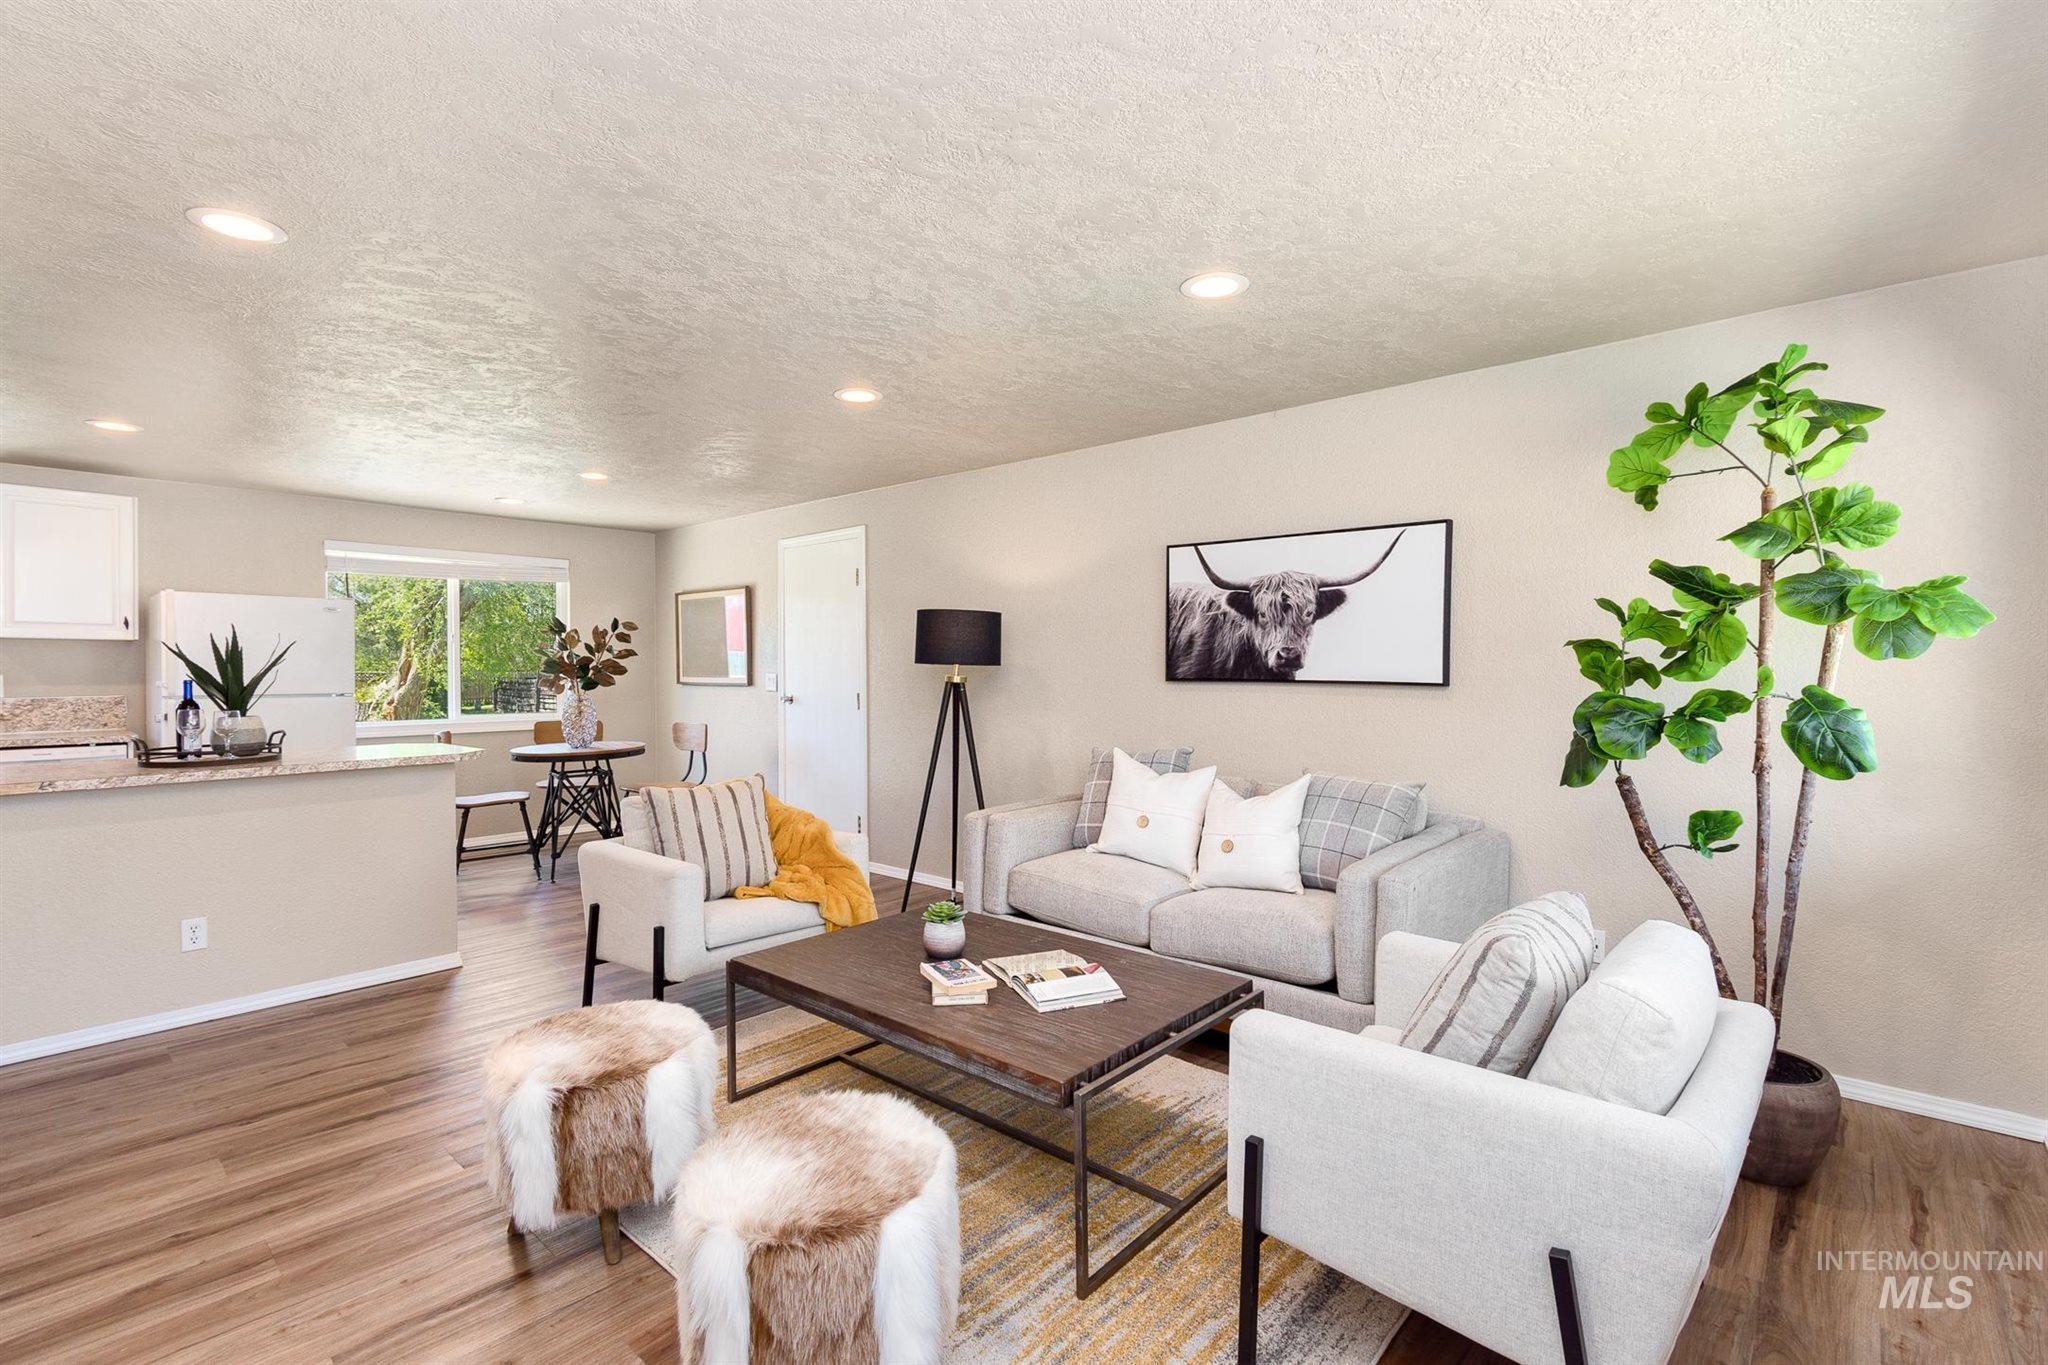 6747 S Ironwood Ave Property Photo - Boise, ID real estate listing